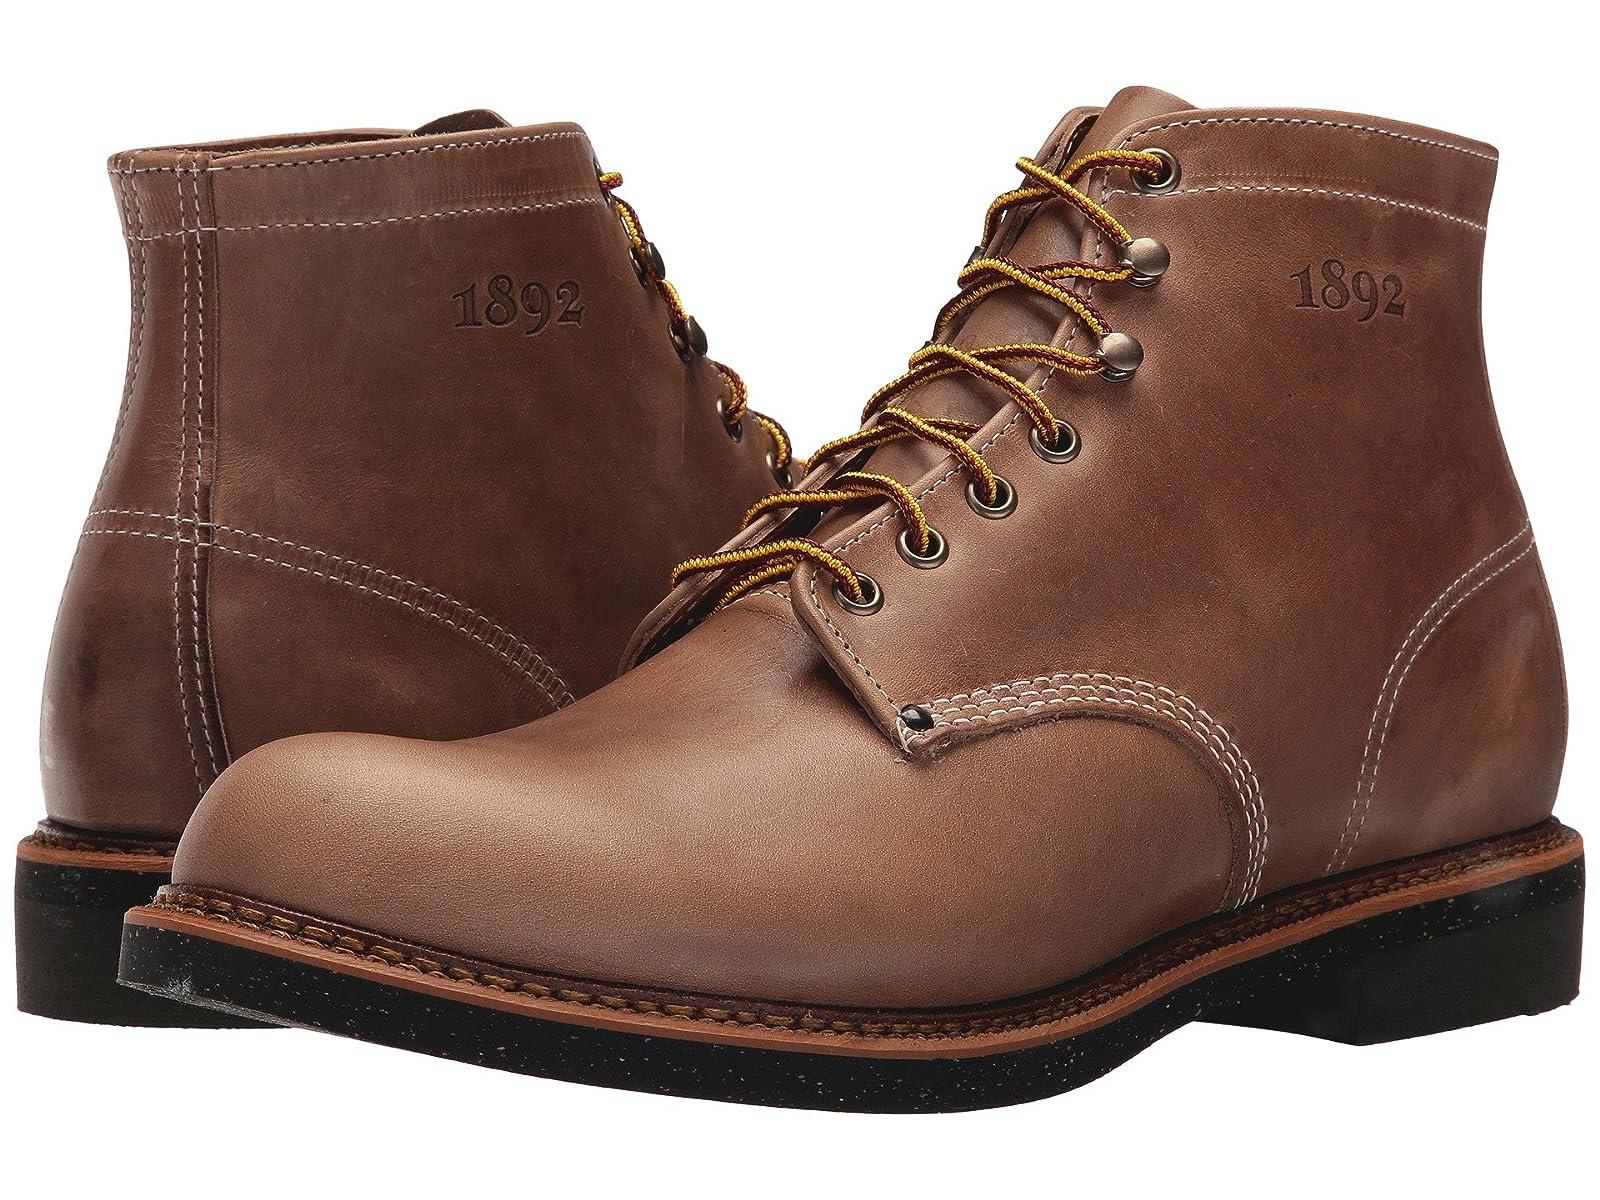 Thorogood Thorogood 1892 - BeloitEconomical and quality shoes